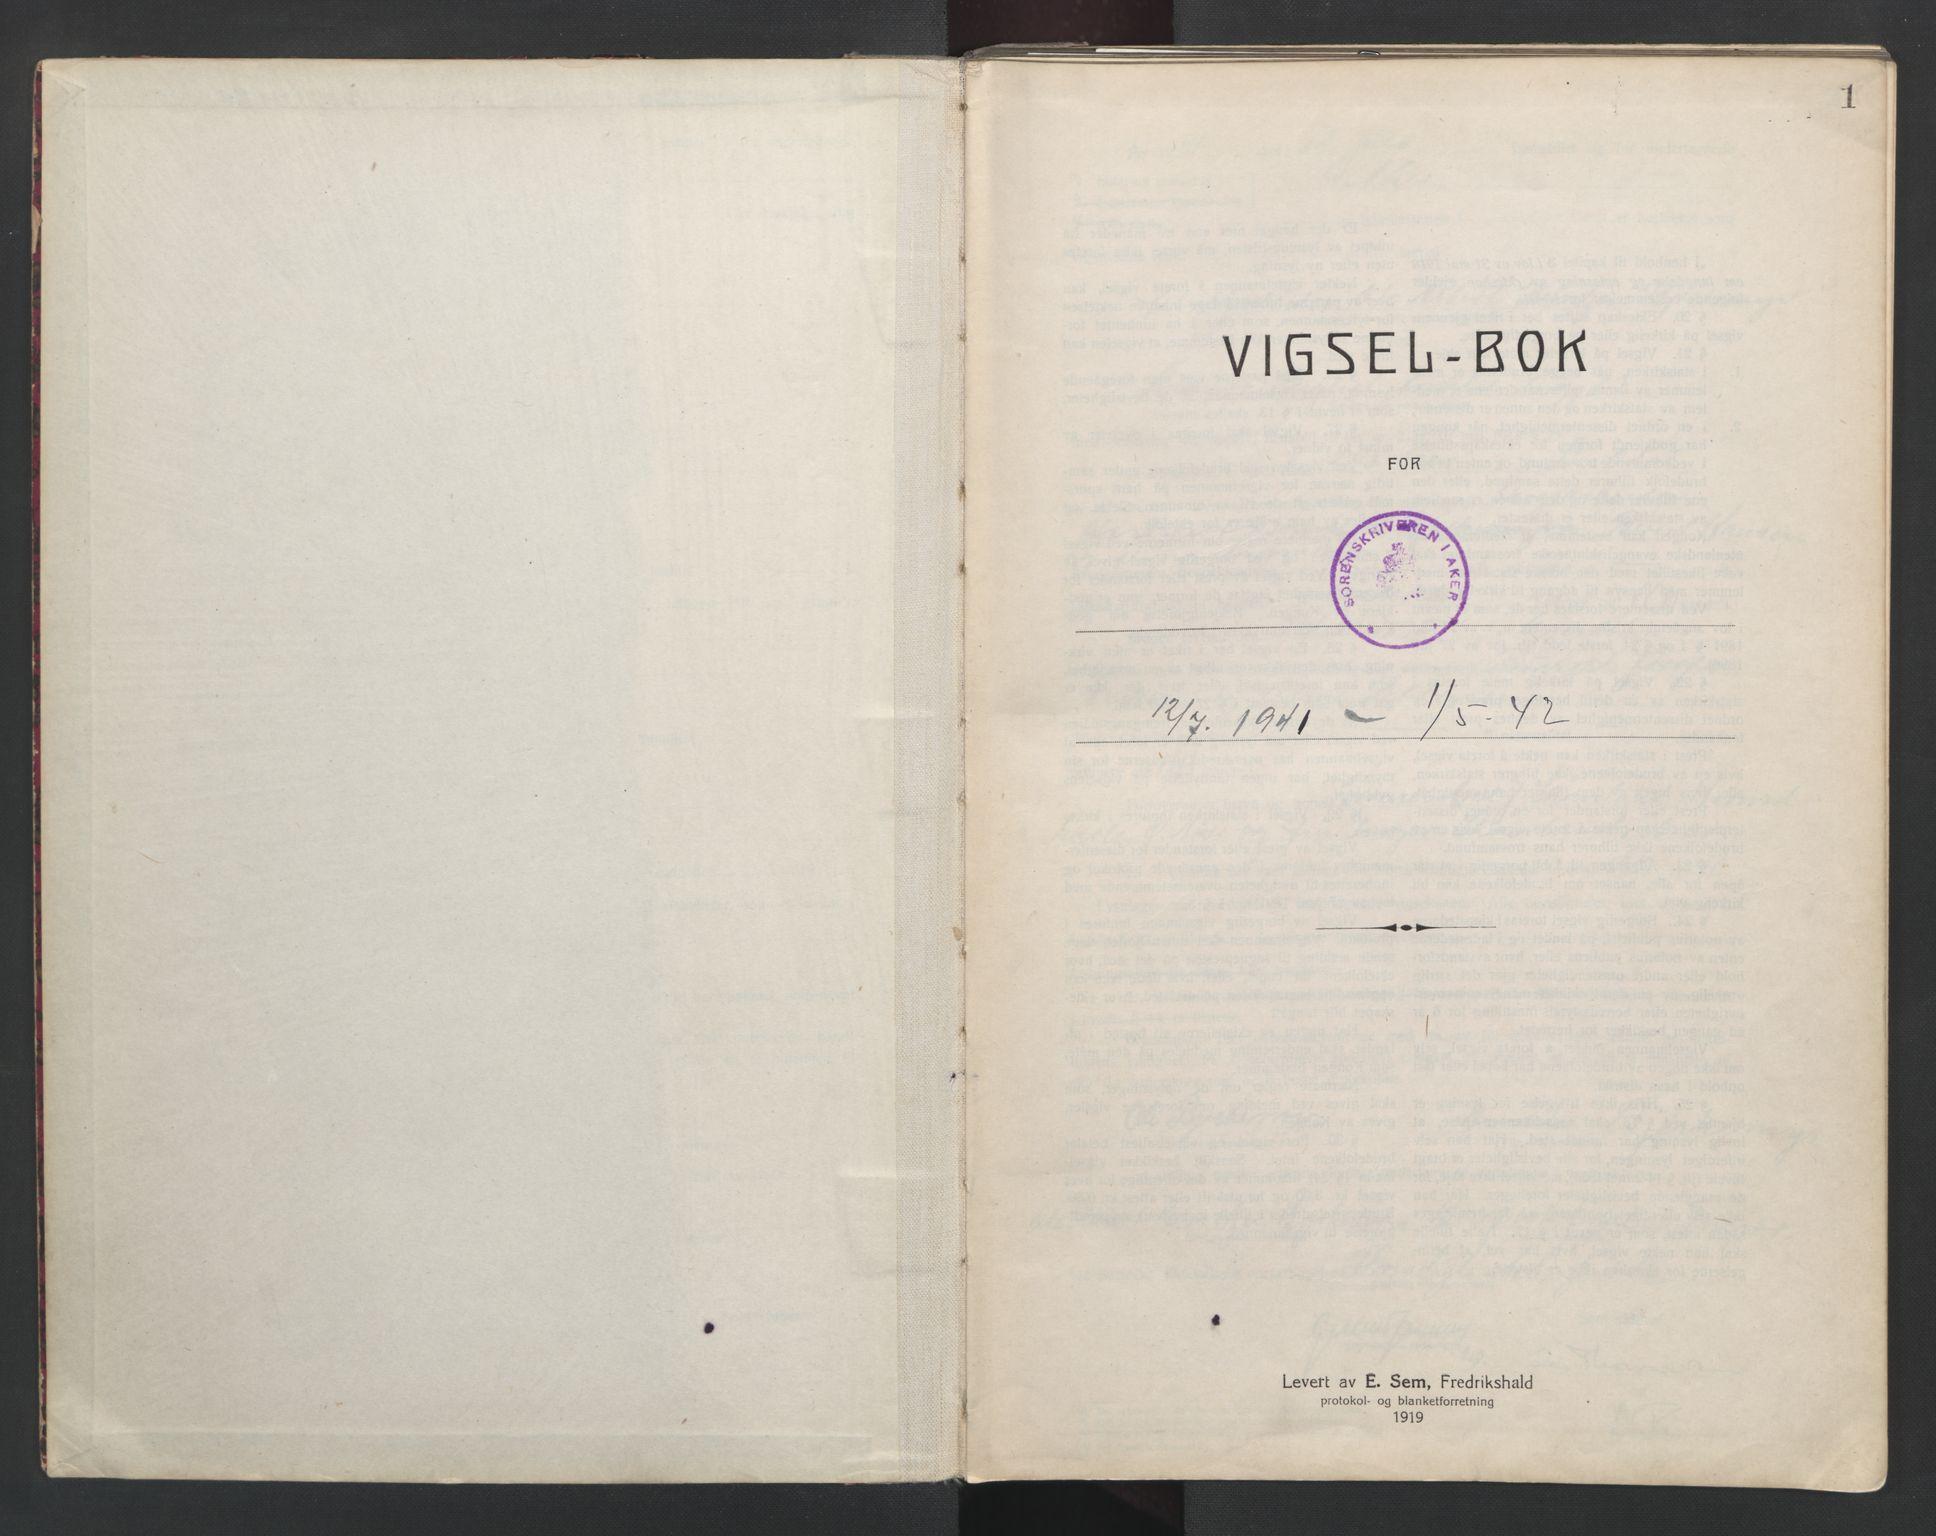 SAO, Aker sorenskriveri, L/Lc/Lcb/L0014: Vigselprotokoll, 1941-1942, s. 1